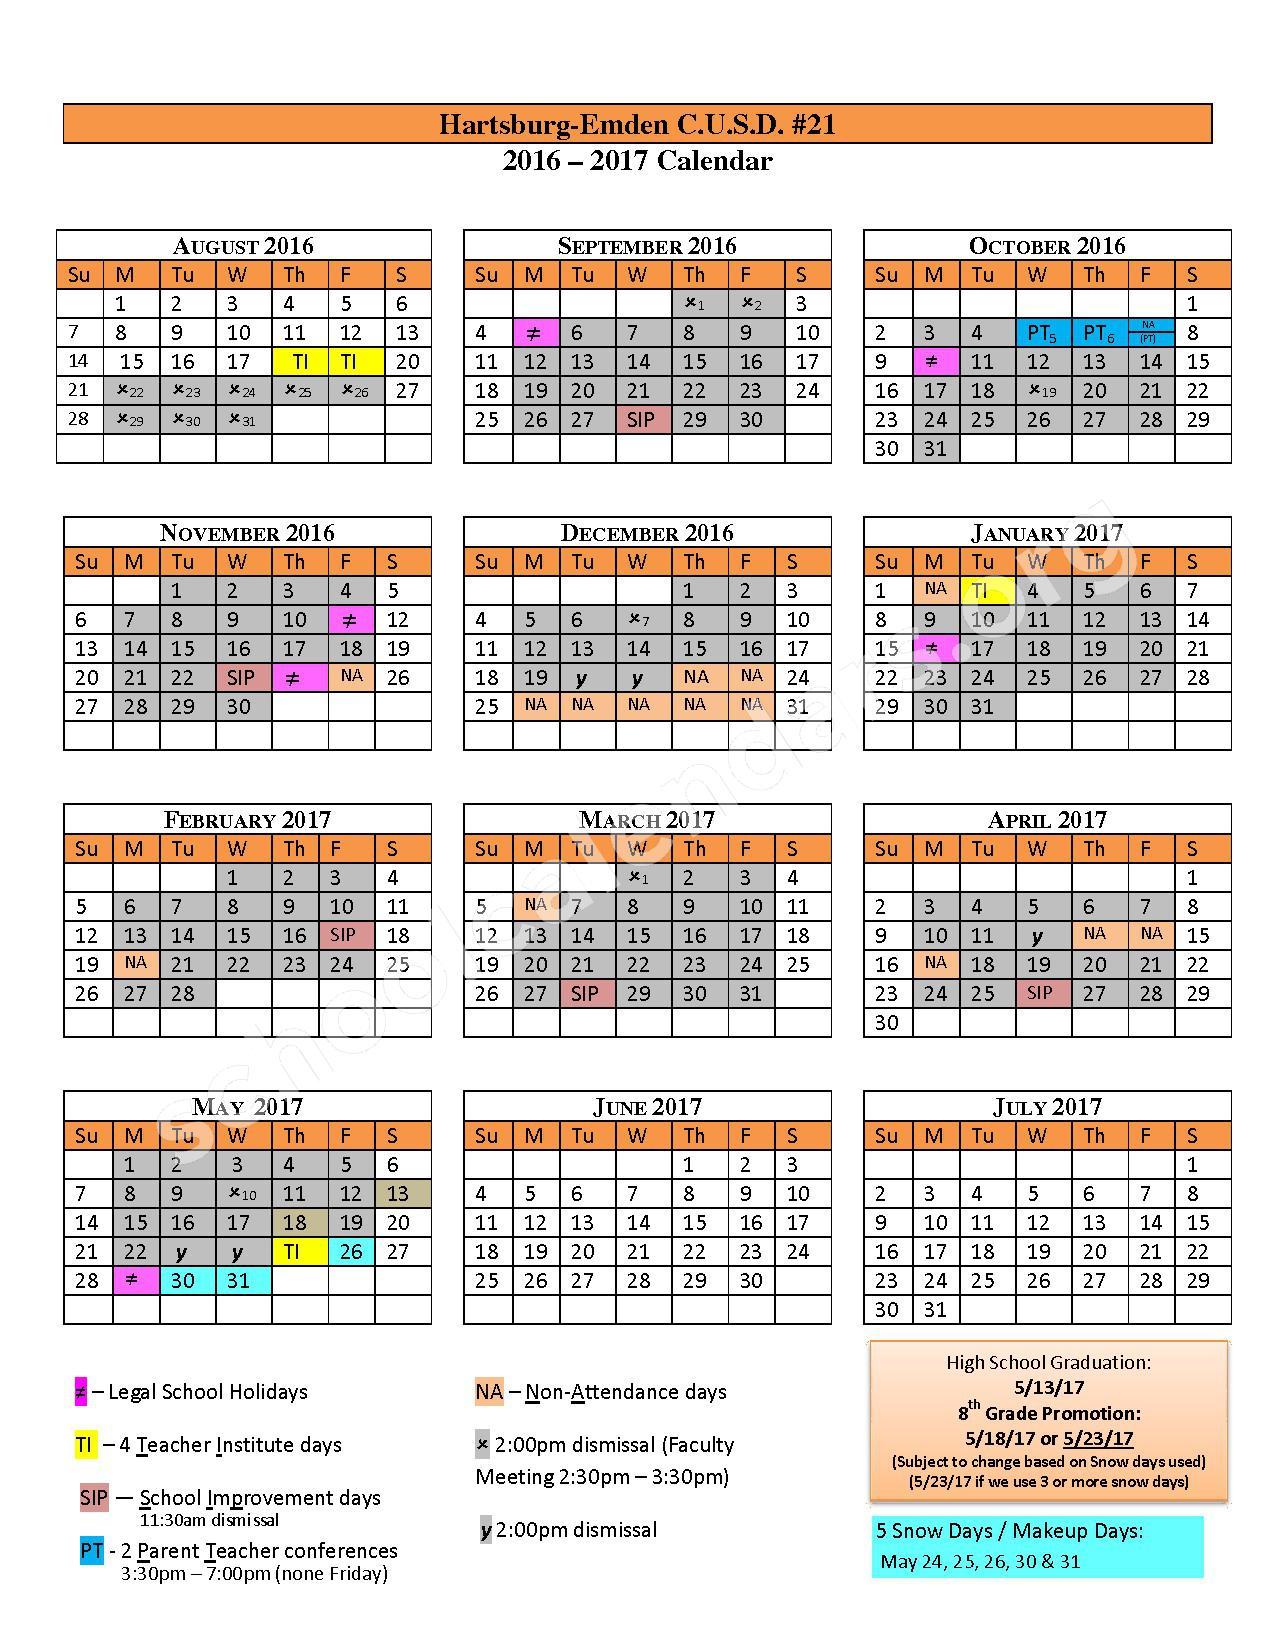 2016 - 2017 School Calendar – Hartsburg-Emden Junior / Senior High School – page 1